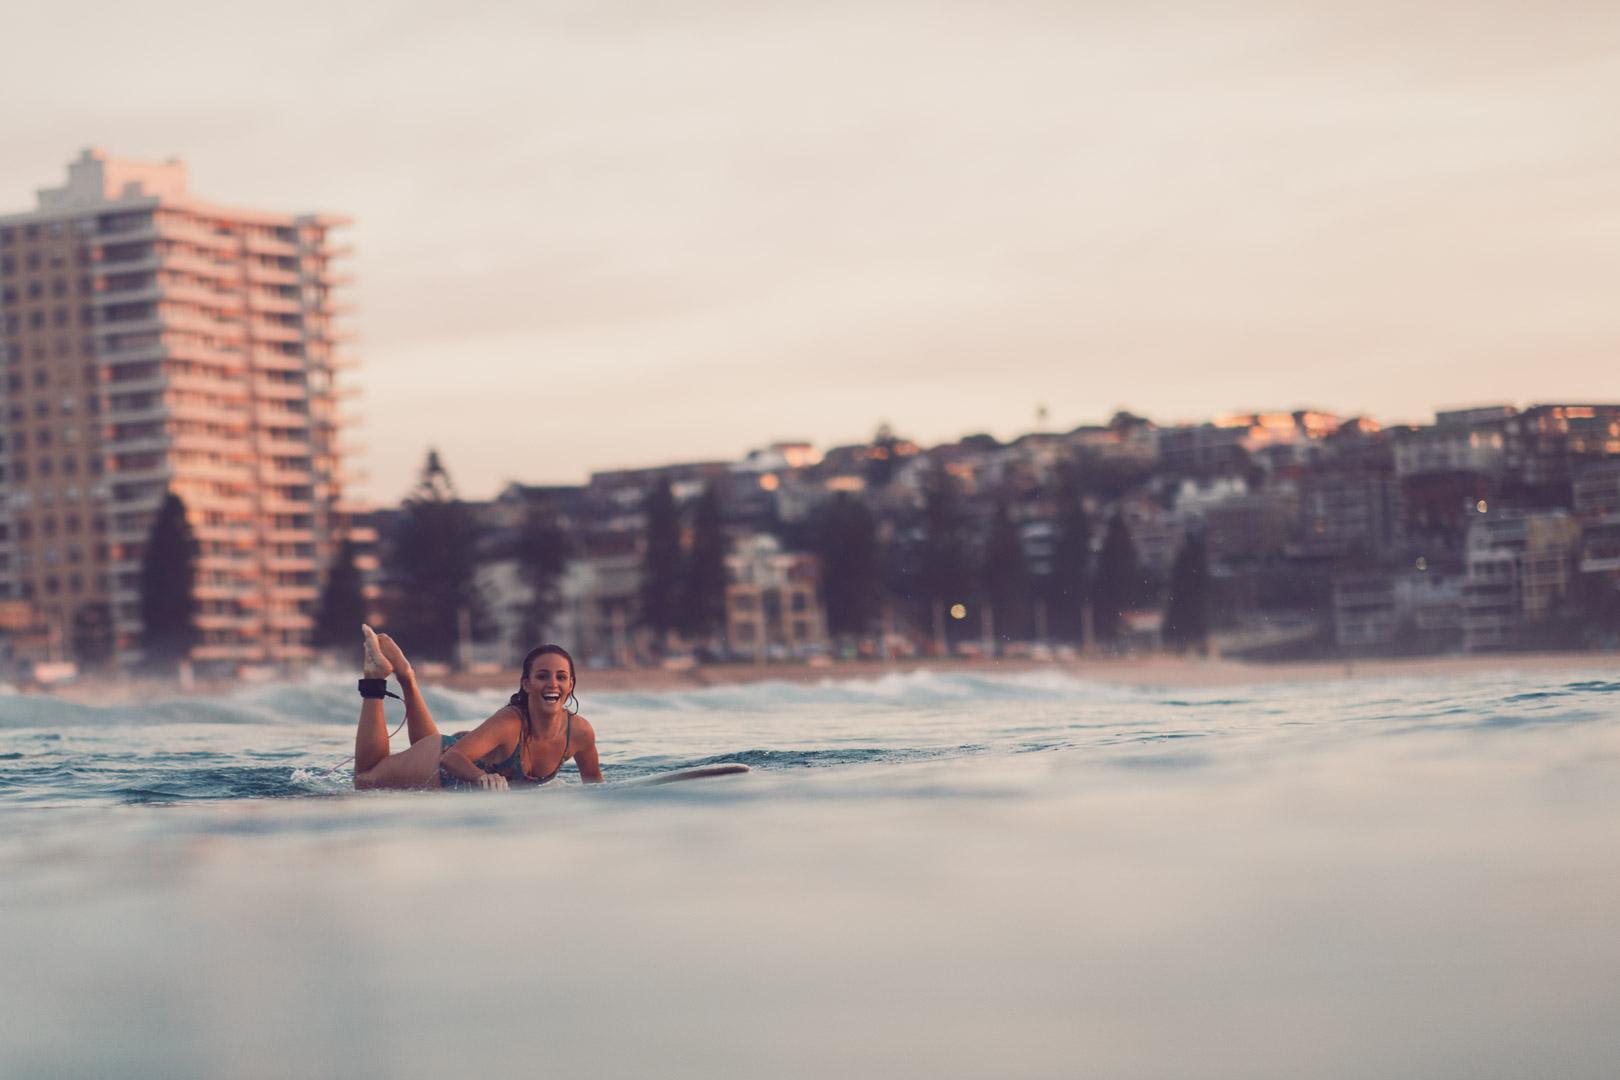 Surfgirl-mxmsurfphoto-Morgan20180508-380-Edit.jpg